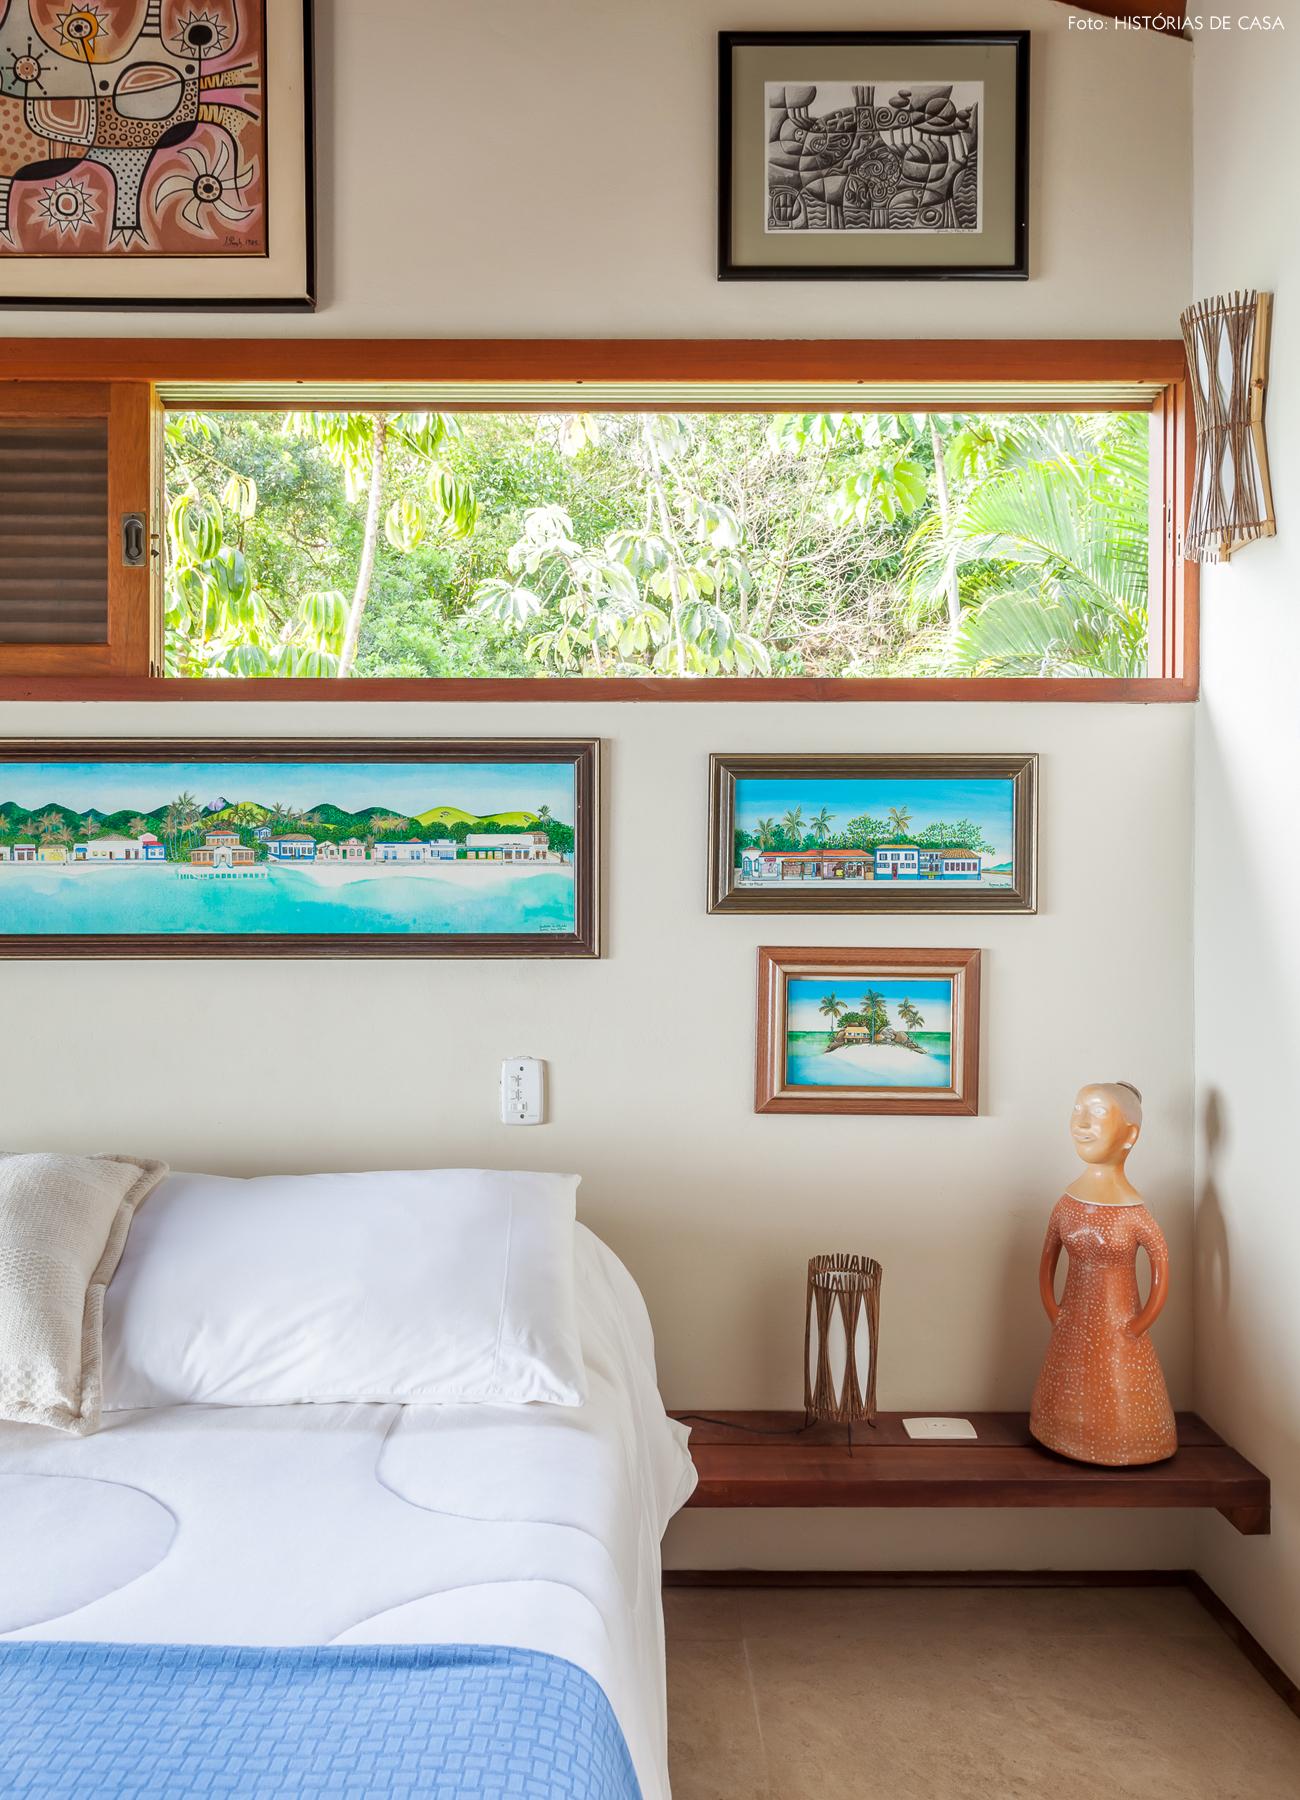 26-decoracao-casa-de-praia-de-madeira-quarto-azul-e-branco